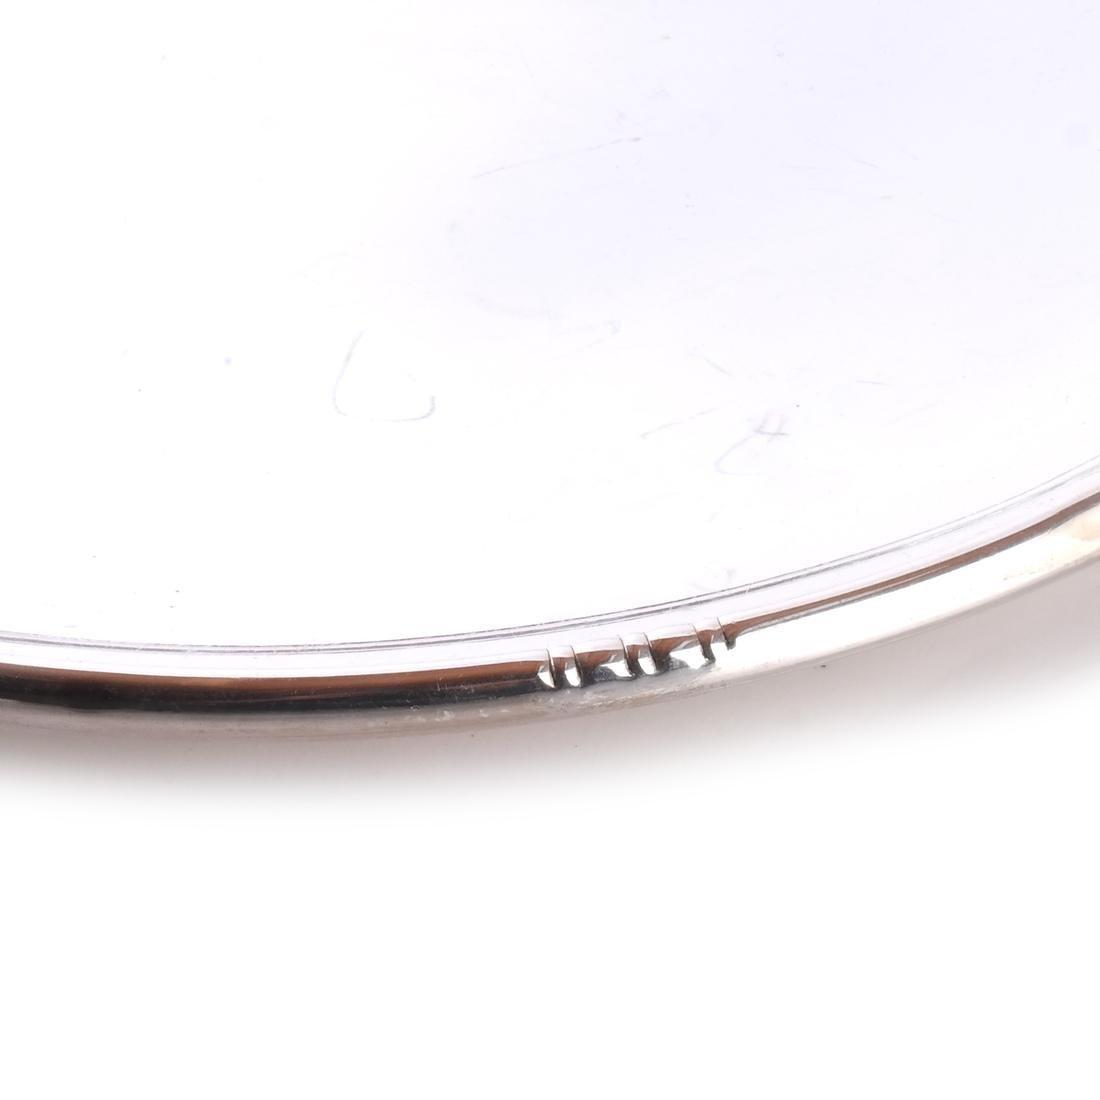 Fisher Silver Jensen-Style Round Tray - 2